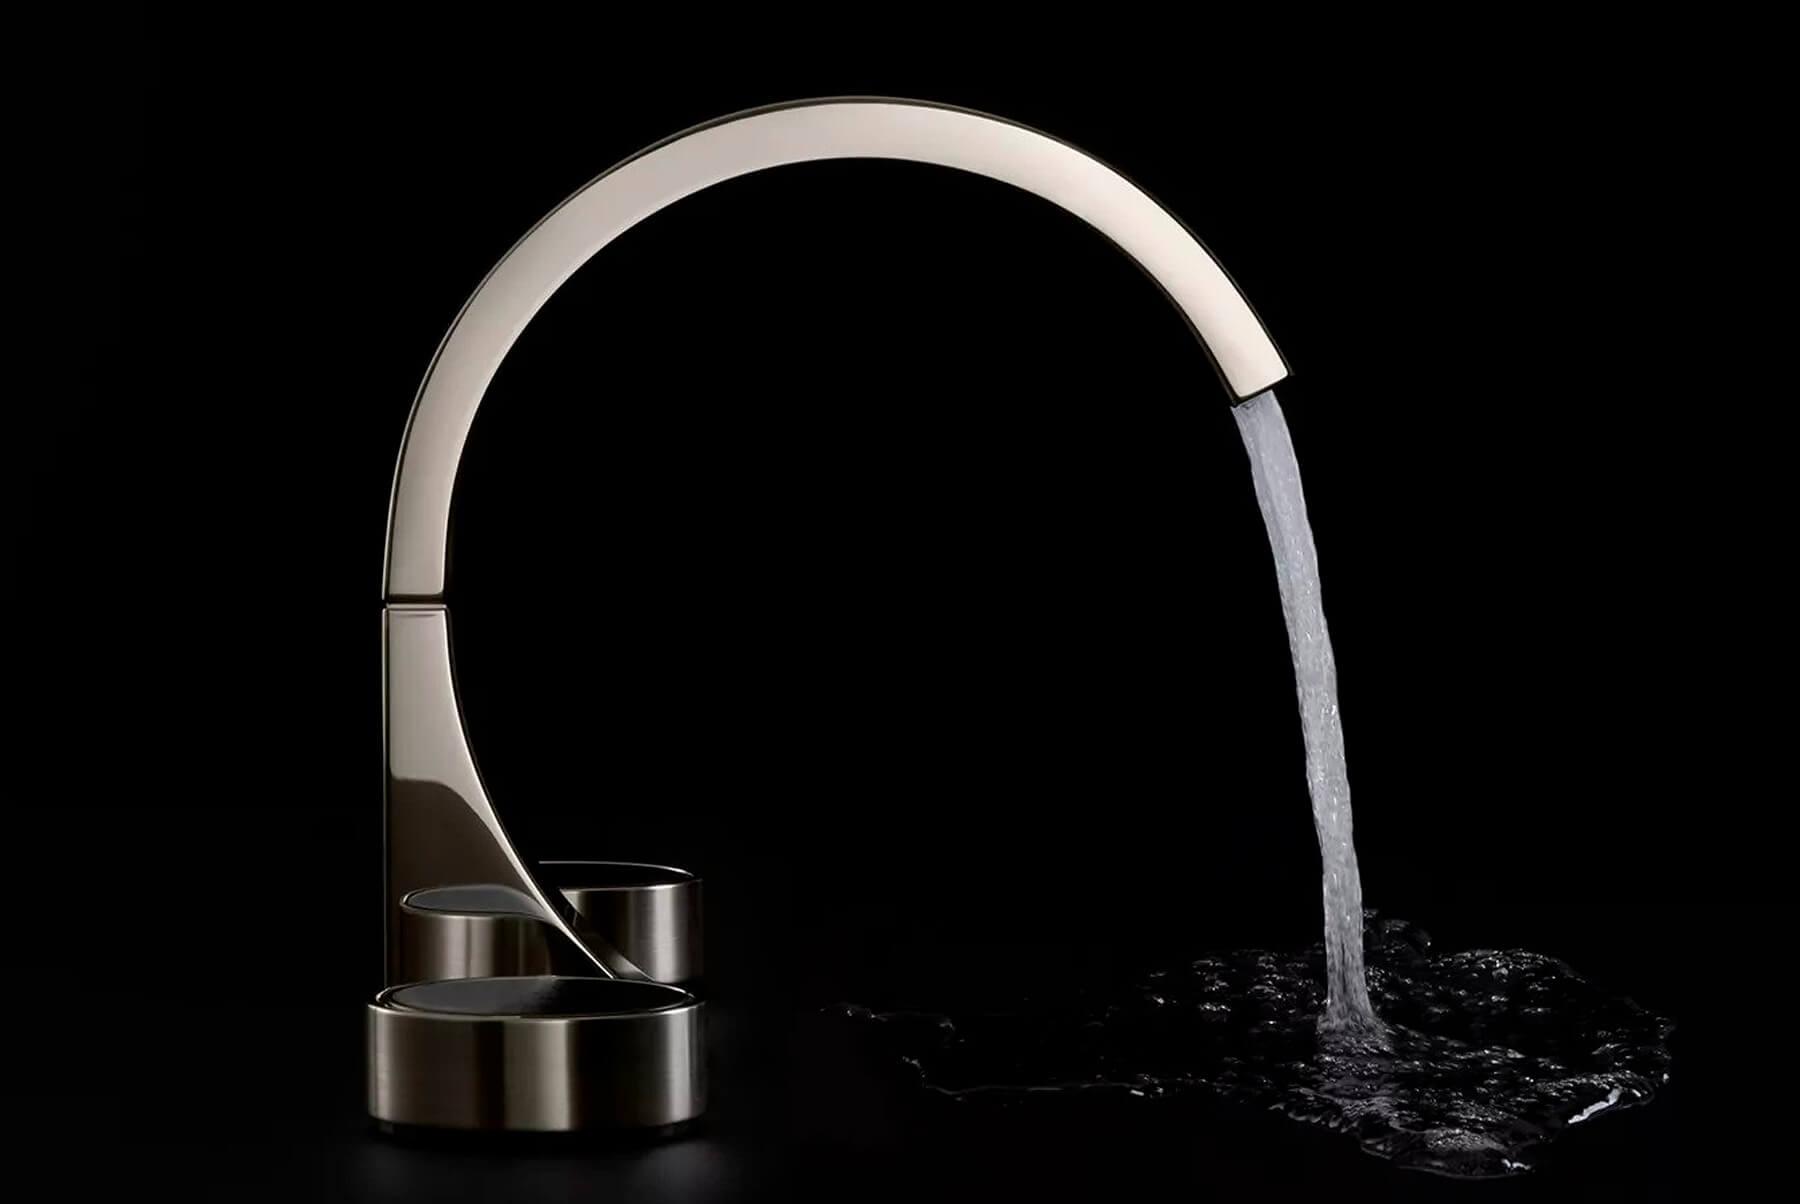 Brassware-DORNBRACHT-CYO-INSET-7-1800x1204